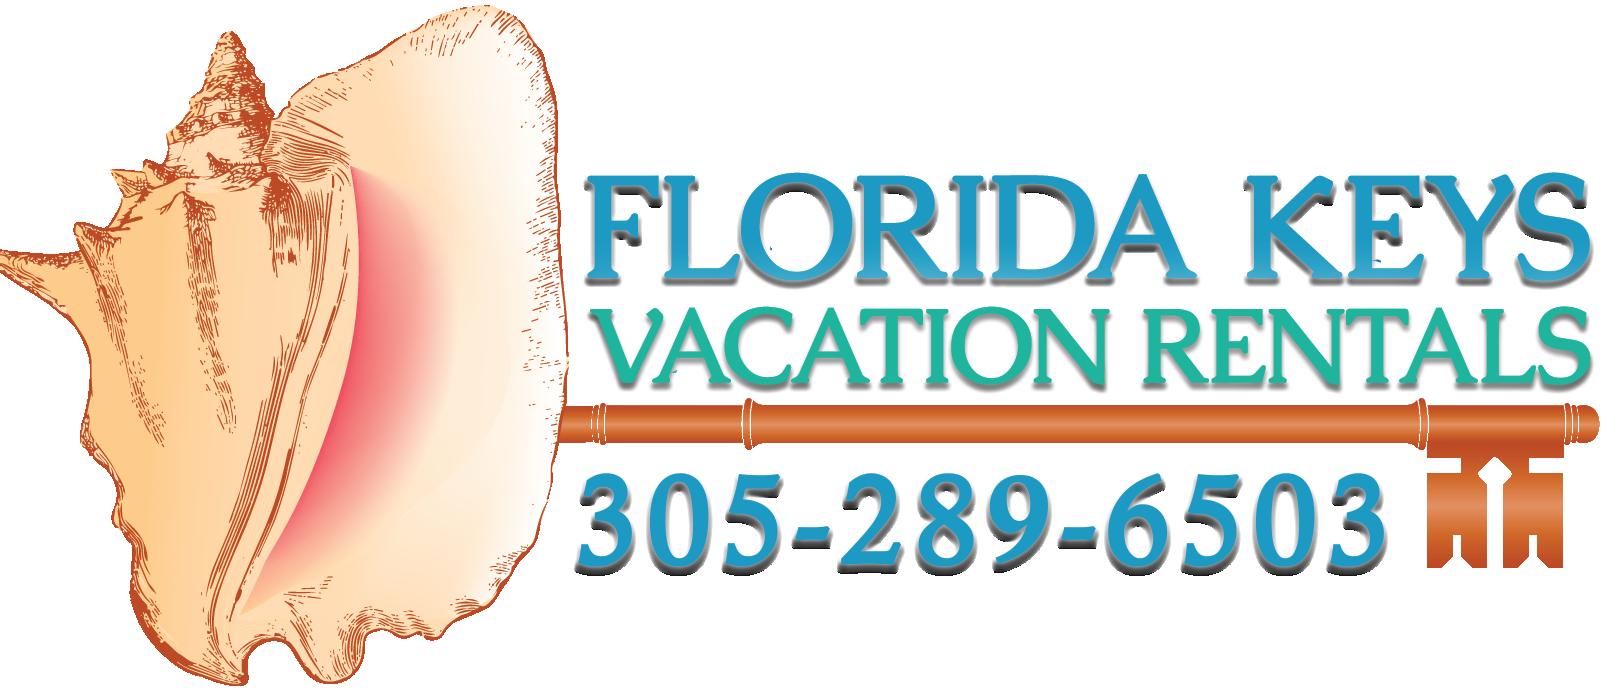 Florida Keys Vacation Rental Blog